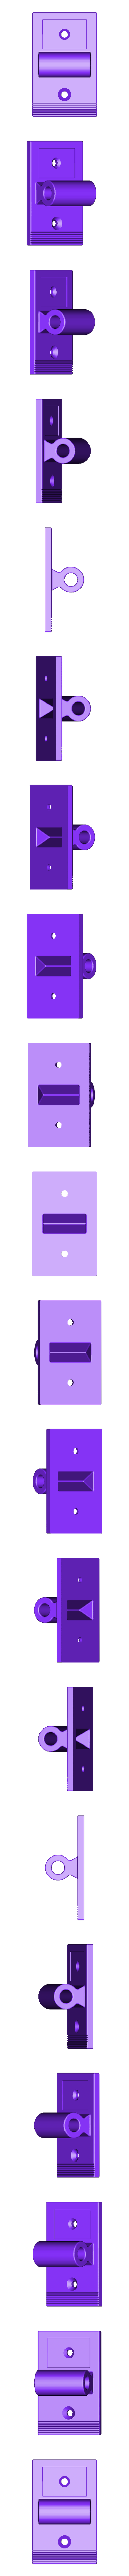 base.stl Download free STL file Wall Pin • 3D printing design, omni-moulage